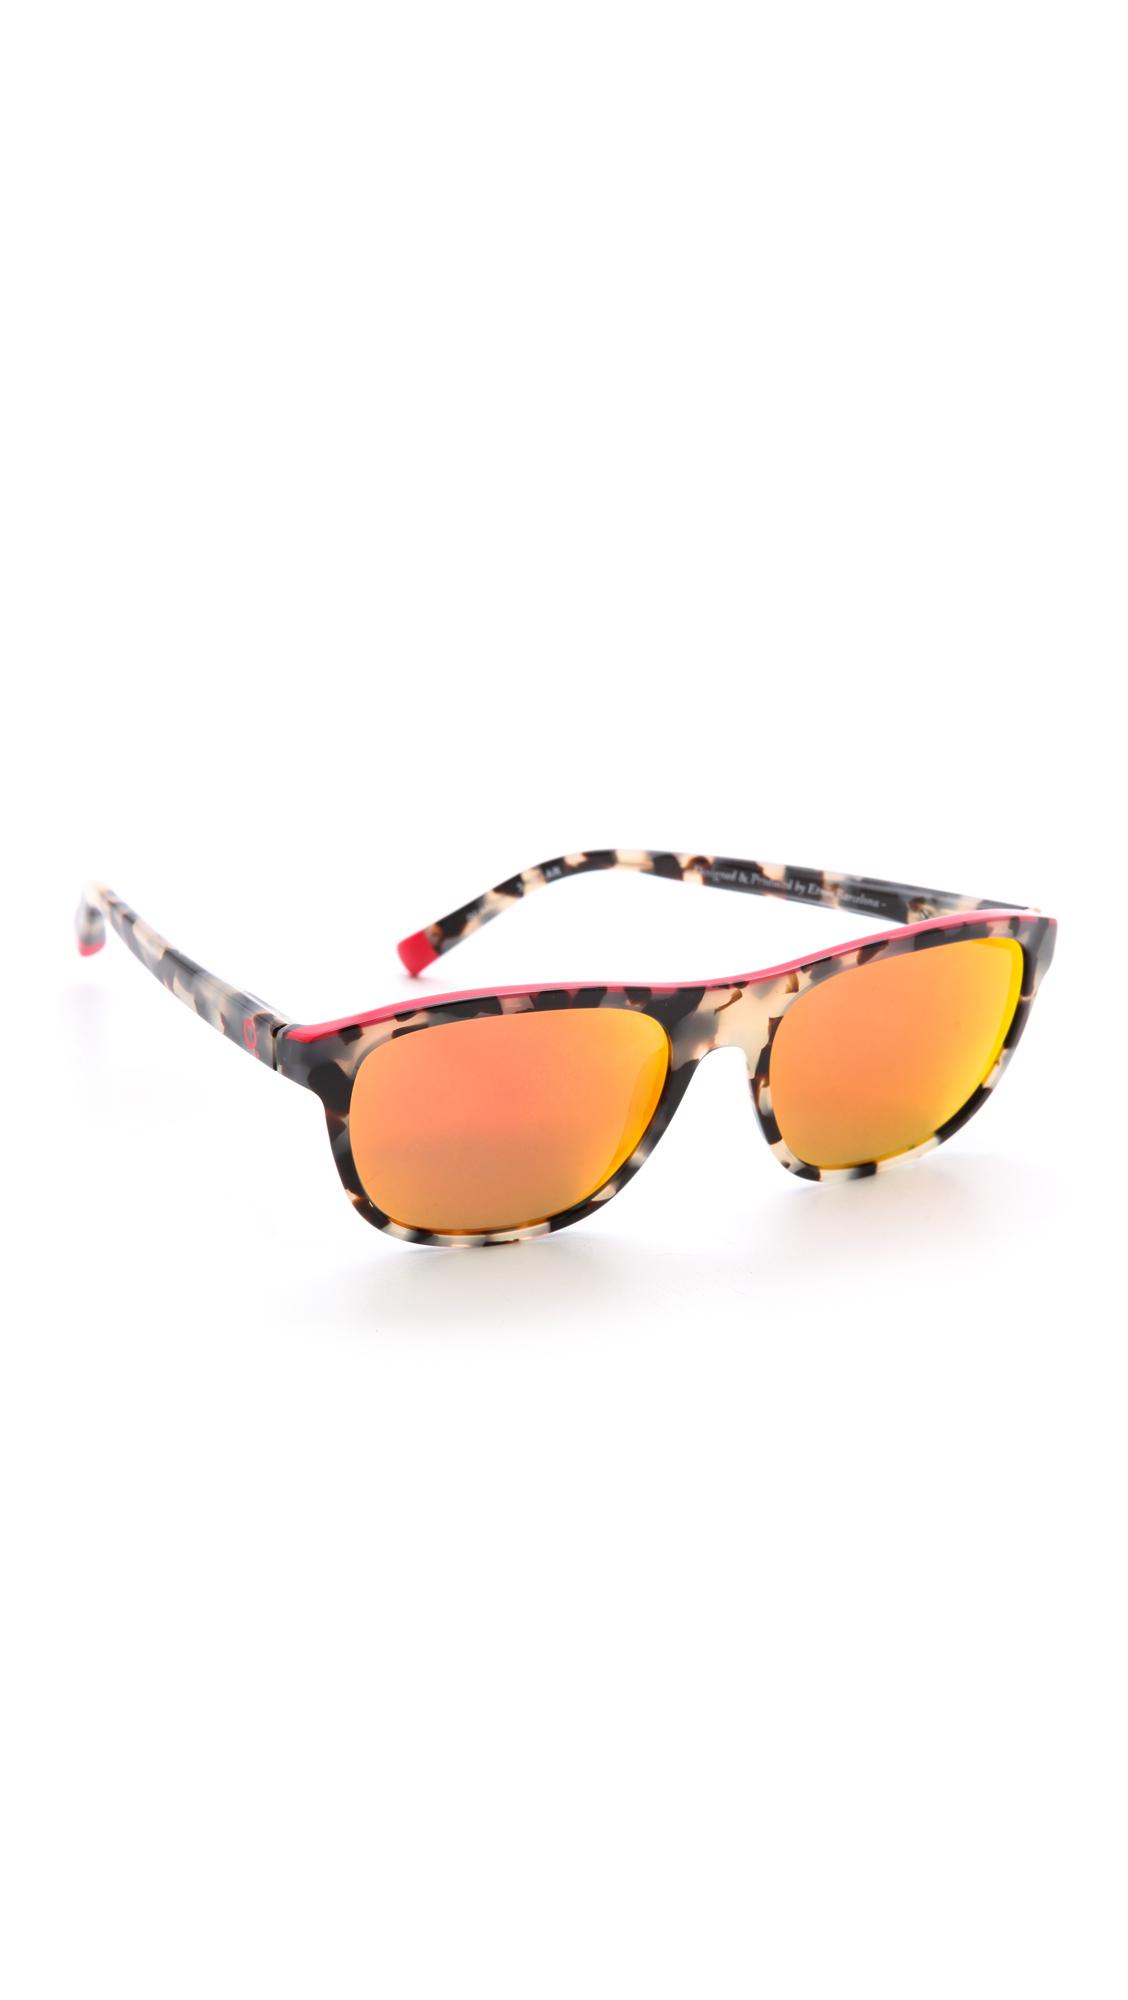 Etnia Barcelona Africa 02 Mirrored Sunglasses Havana Red